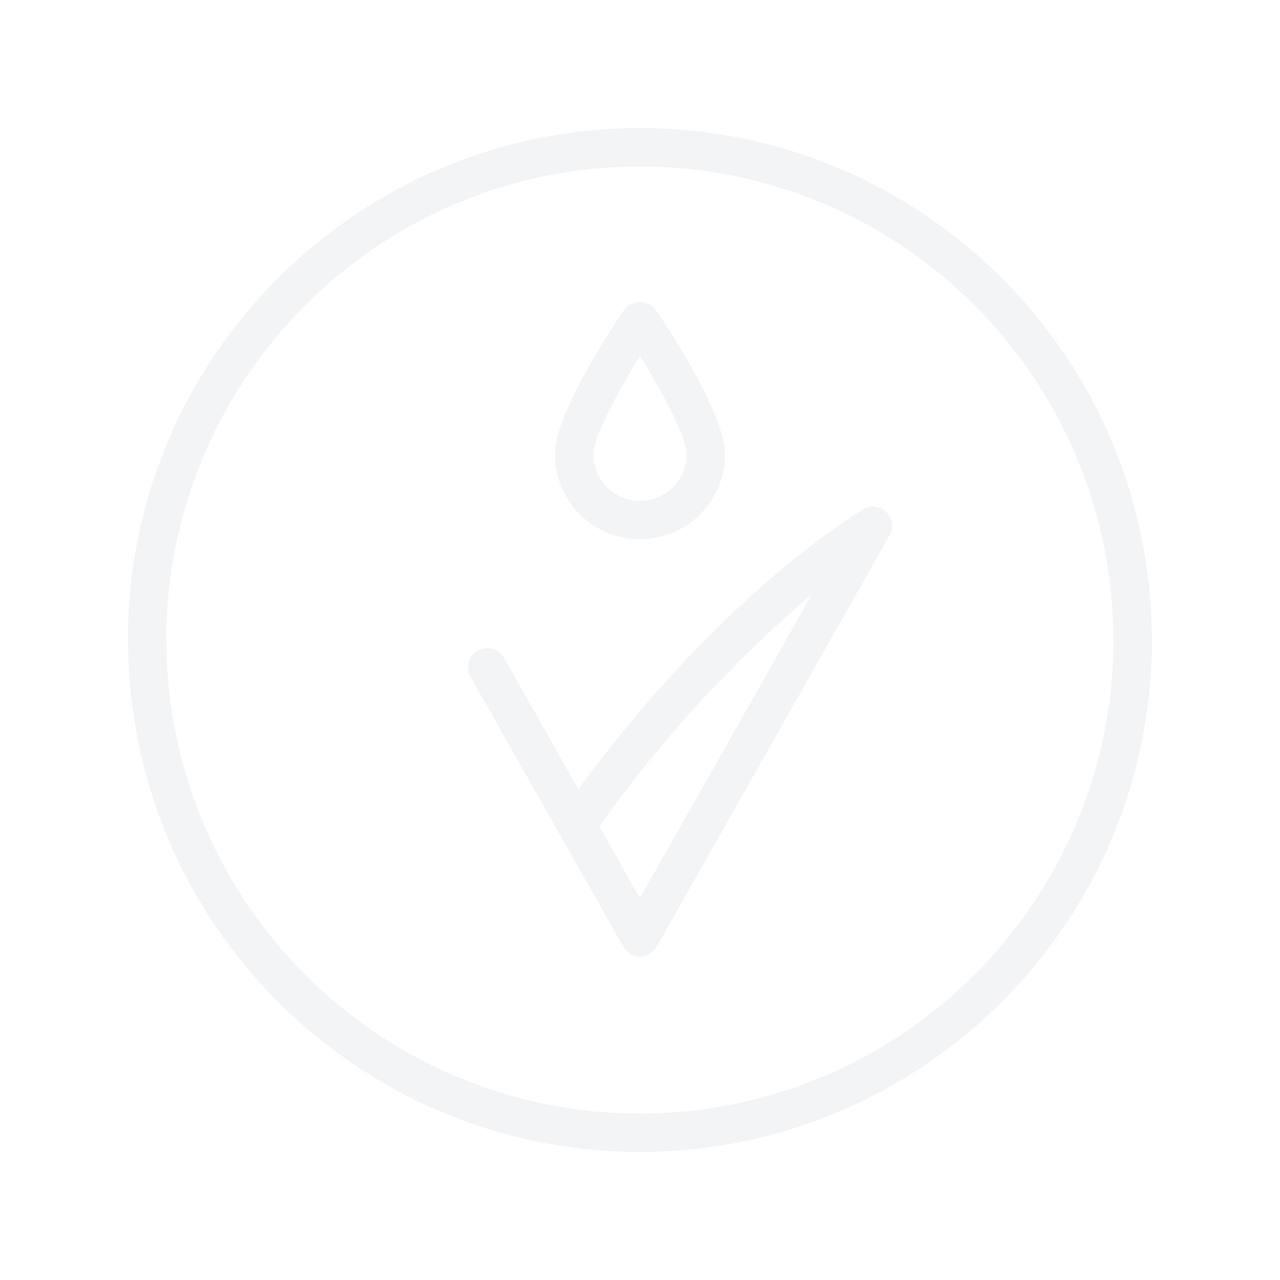 KOCOSTAR 5 Finger Nail Pack увлажняющая маска для рук 4g